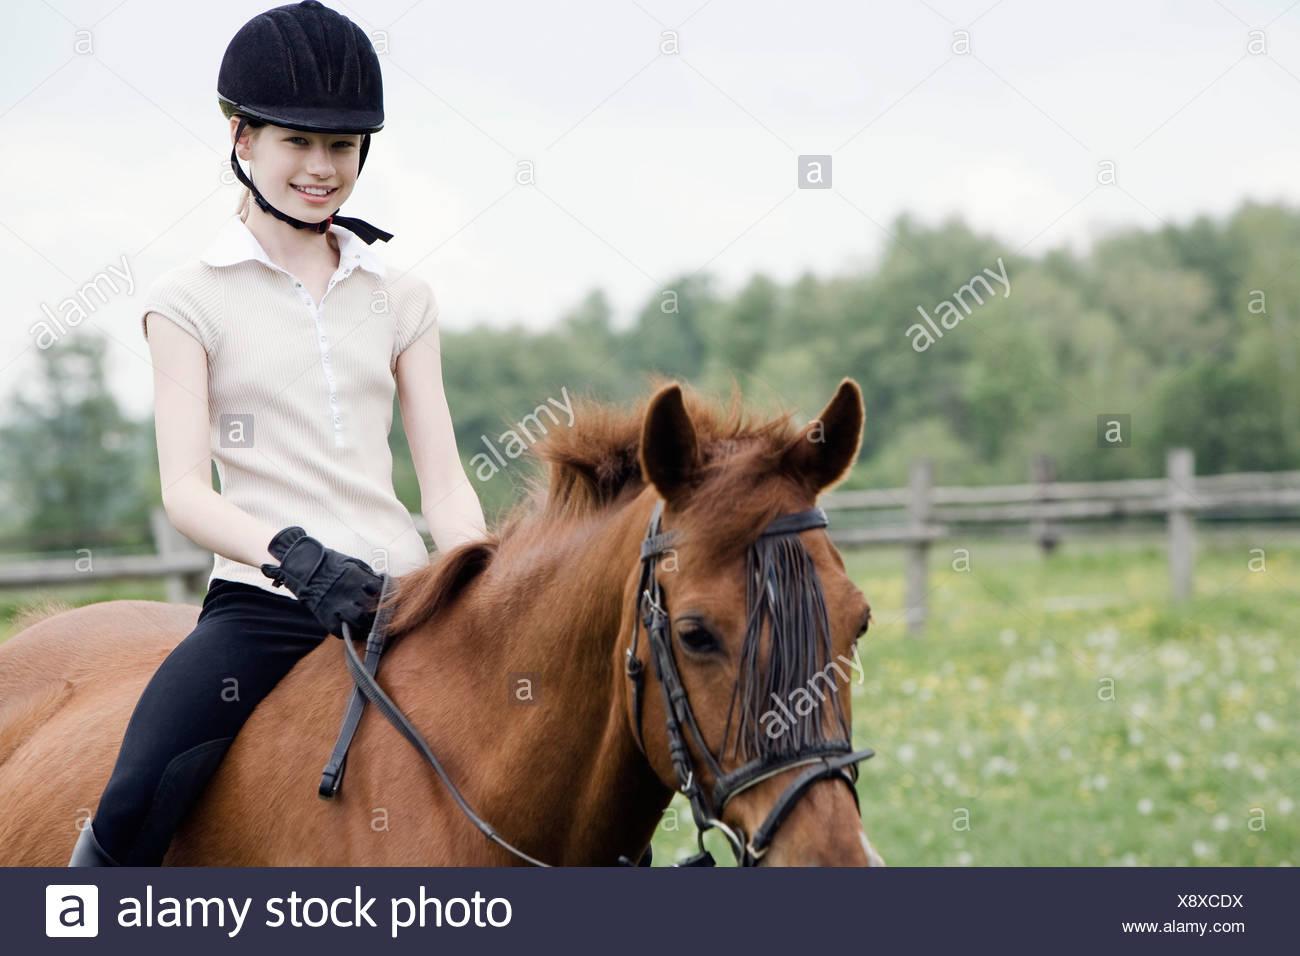 portrait of young girl doing horseback riding - Stock Image